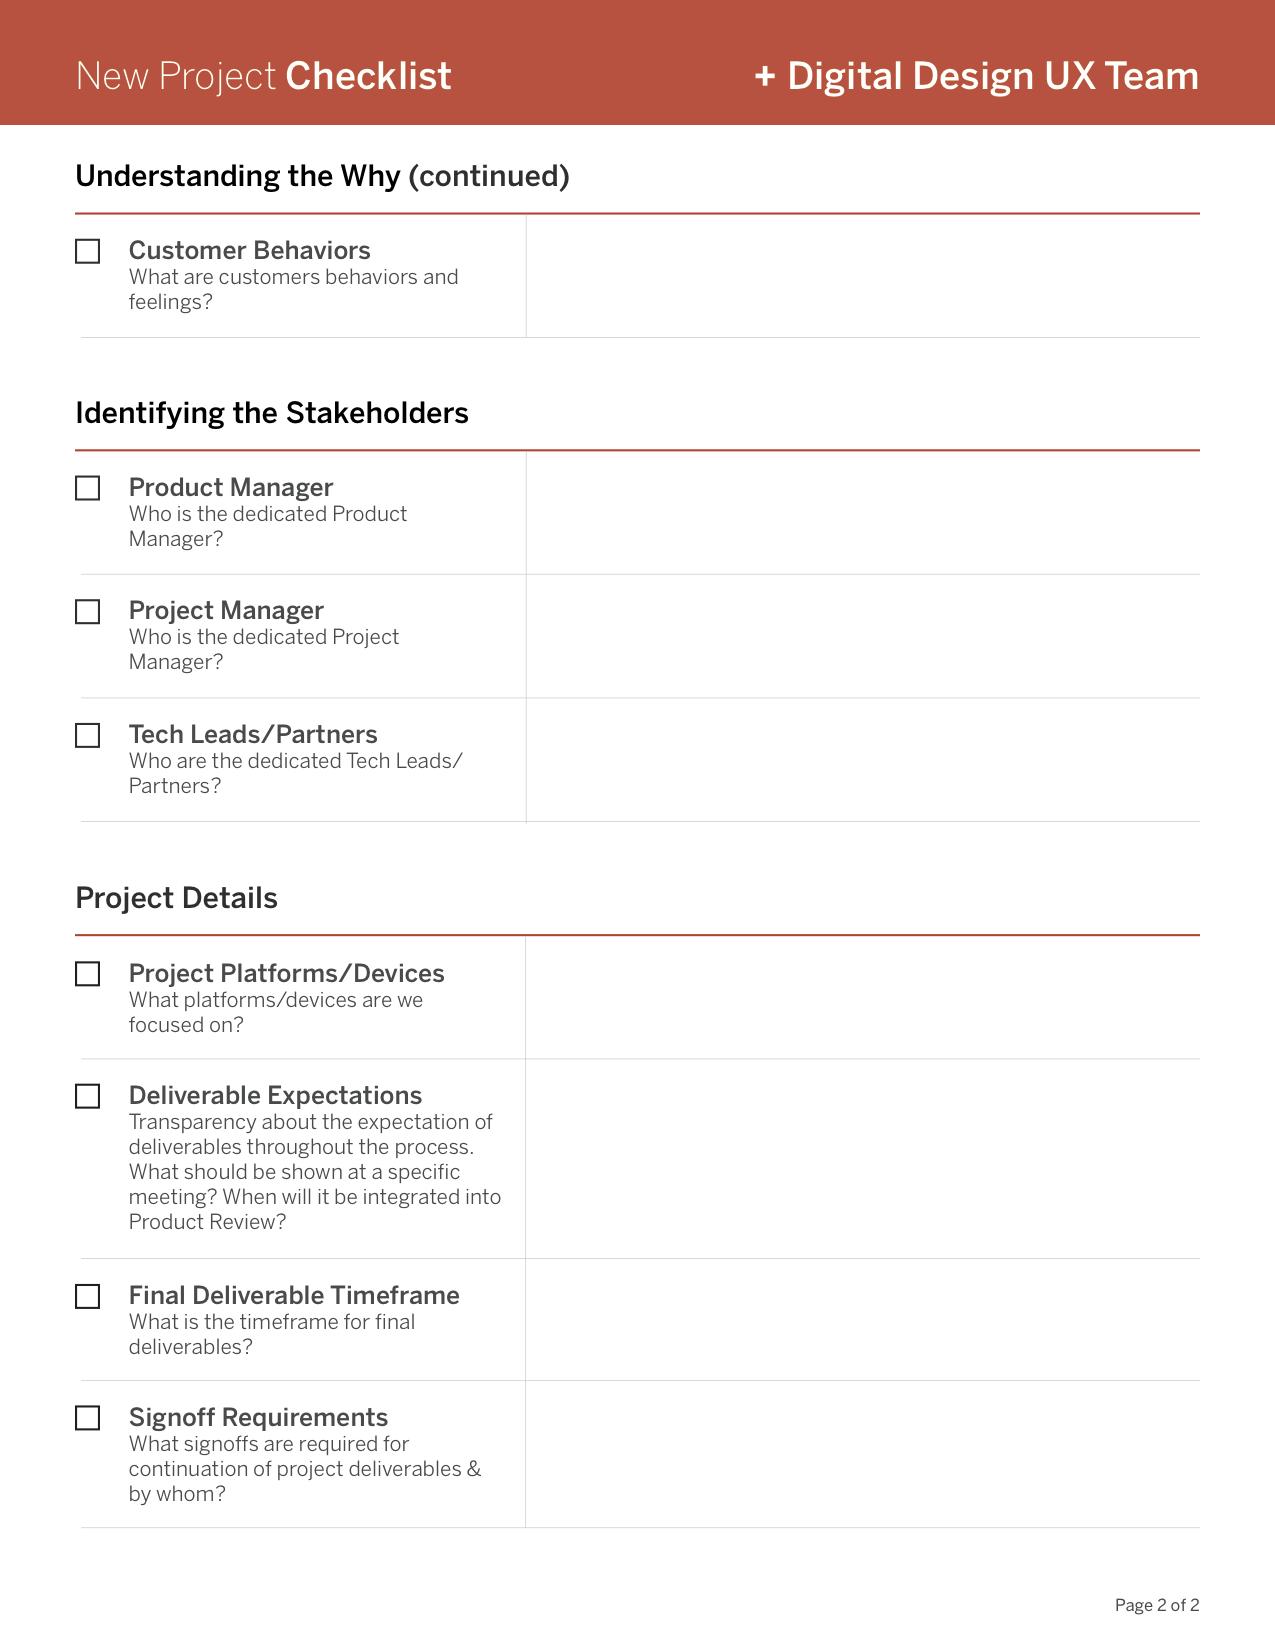 espn-ux-process-newproject-checklist.png